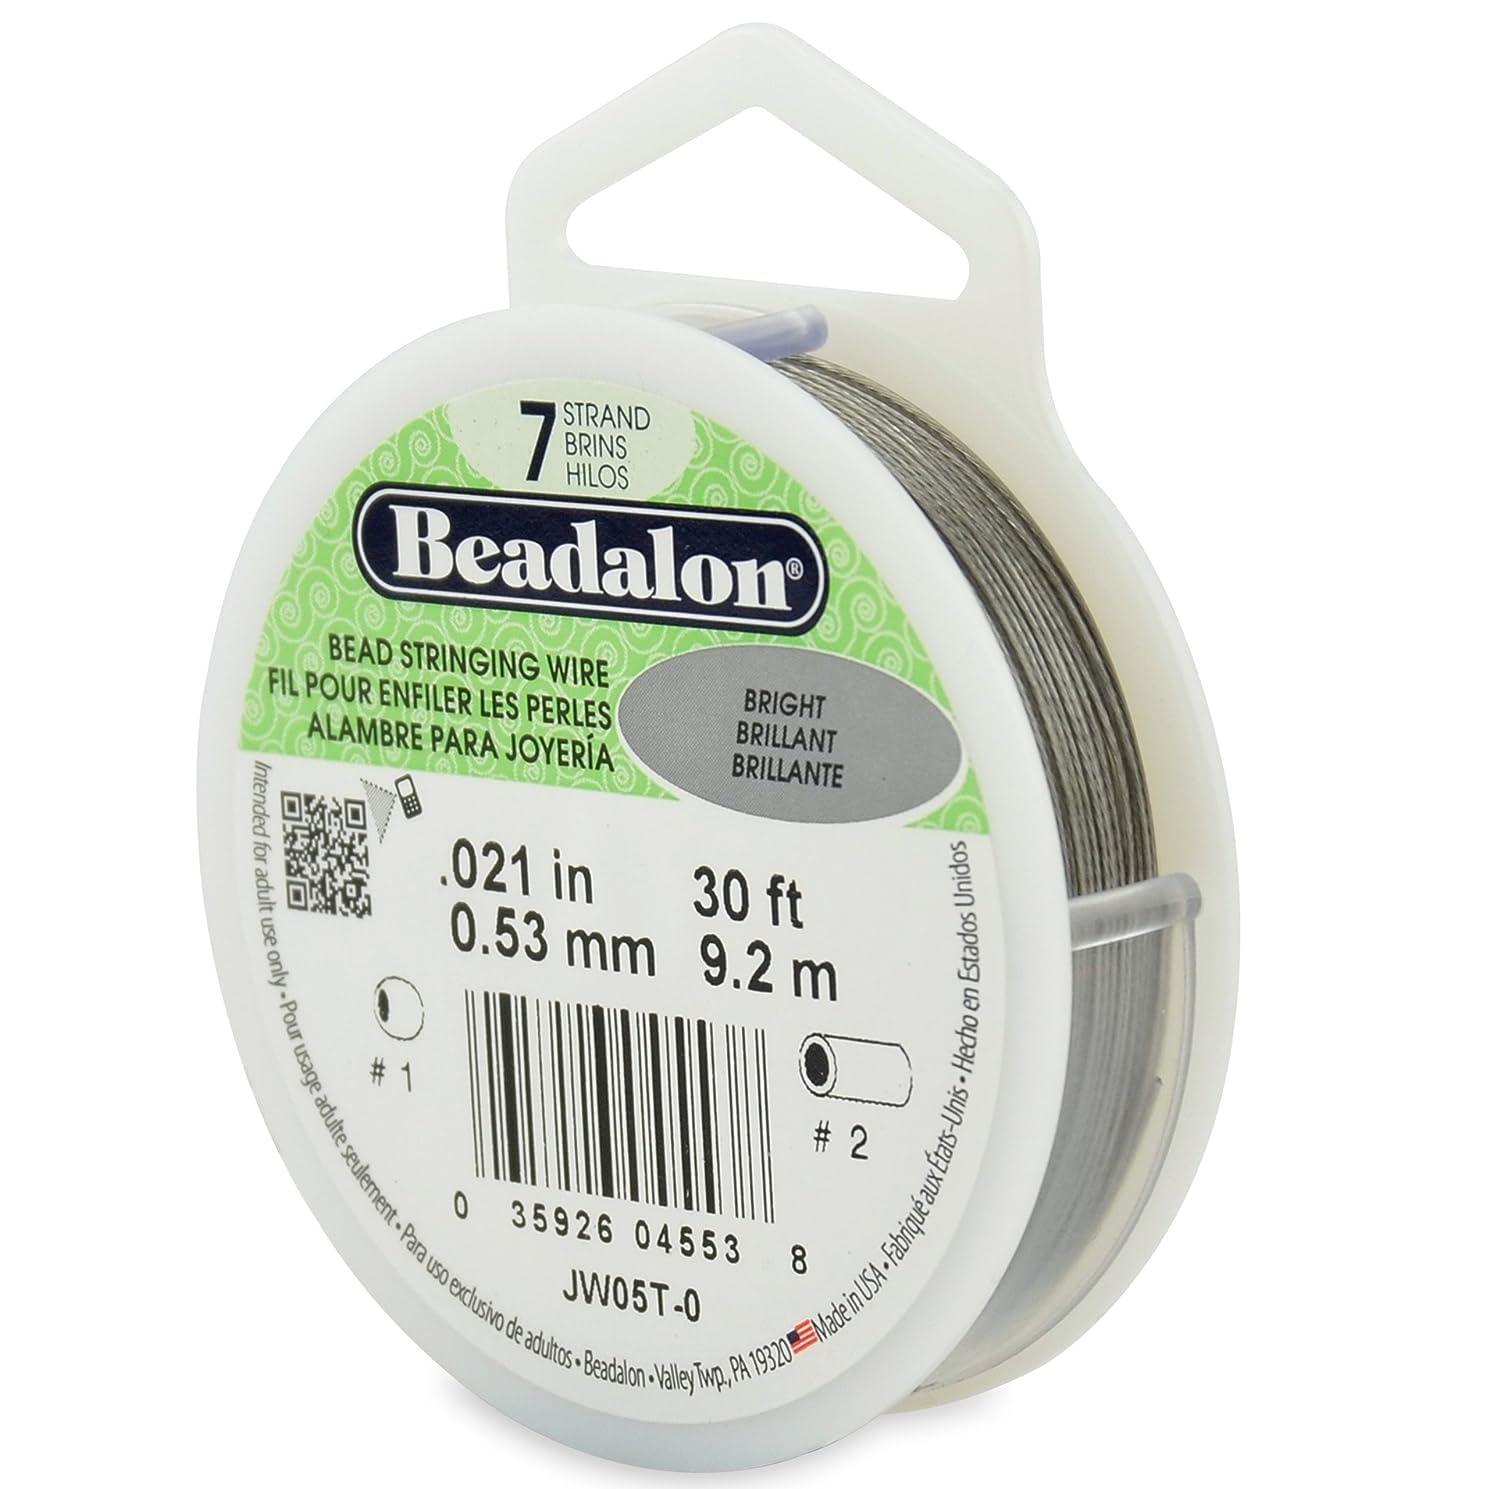 Beadalon 30-Feet 7-Strand Stainless Steel Bead Stringing Wire, 0.021-Inch, Bright